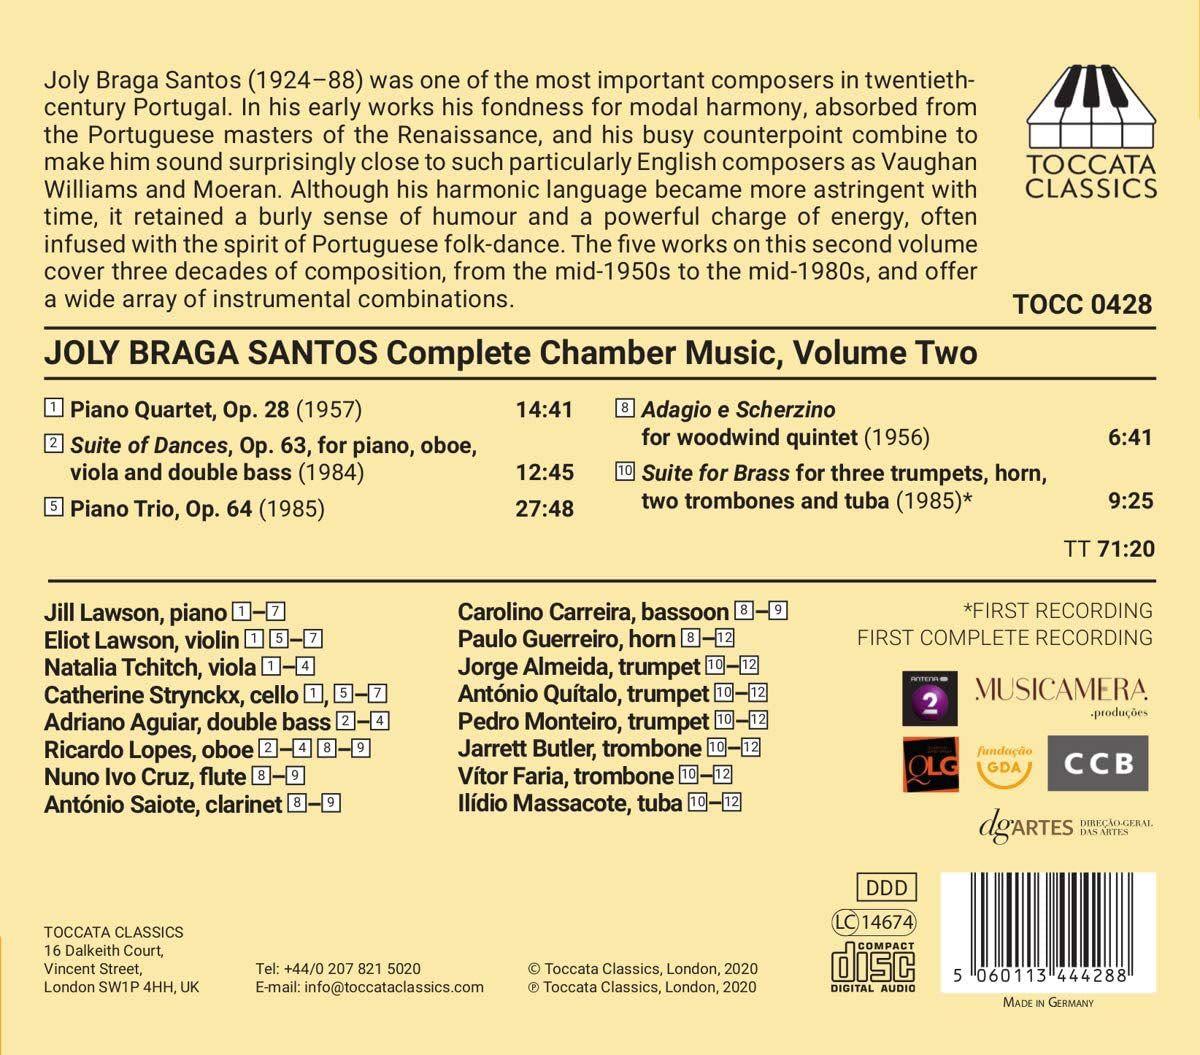 Photo No.2 of Joly Braga Santos: Complete Chamber Music, Volume Two